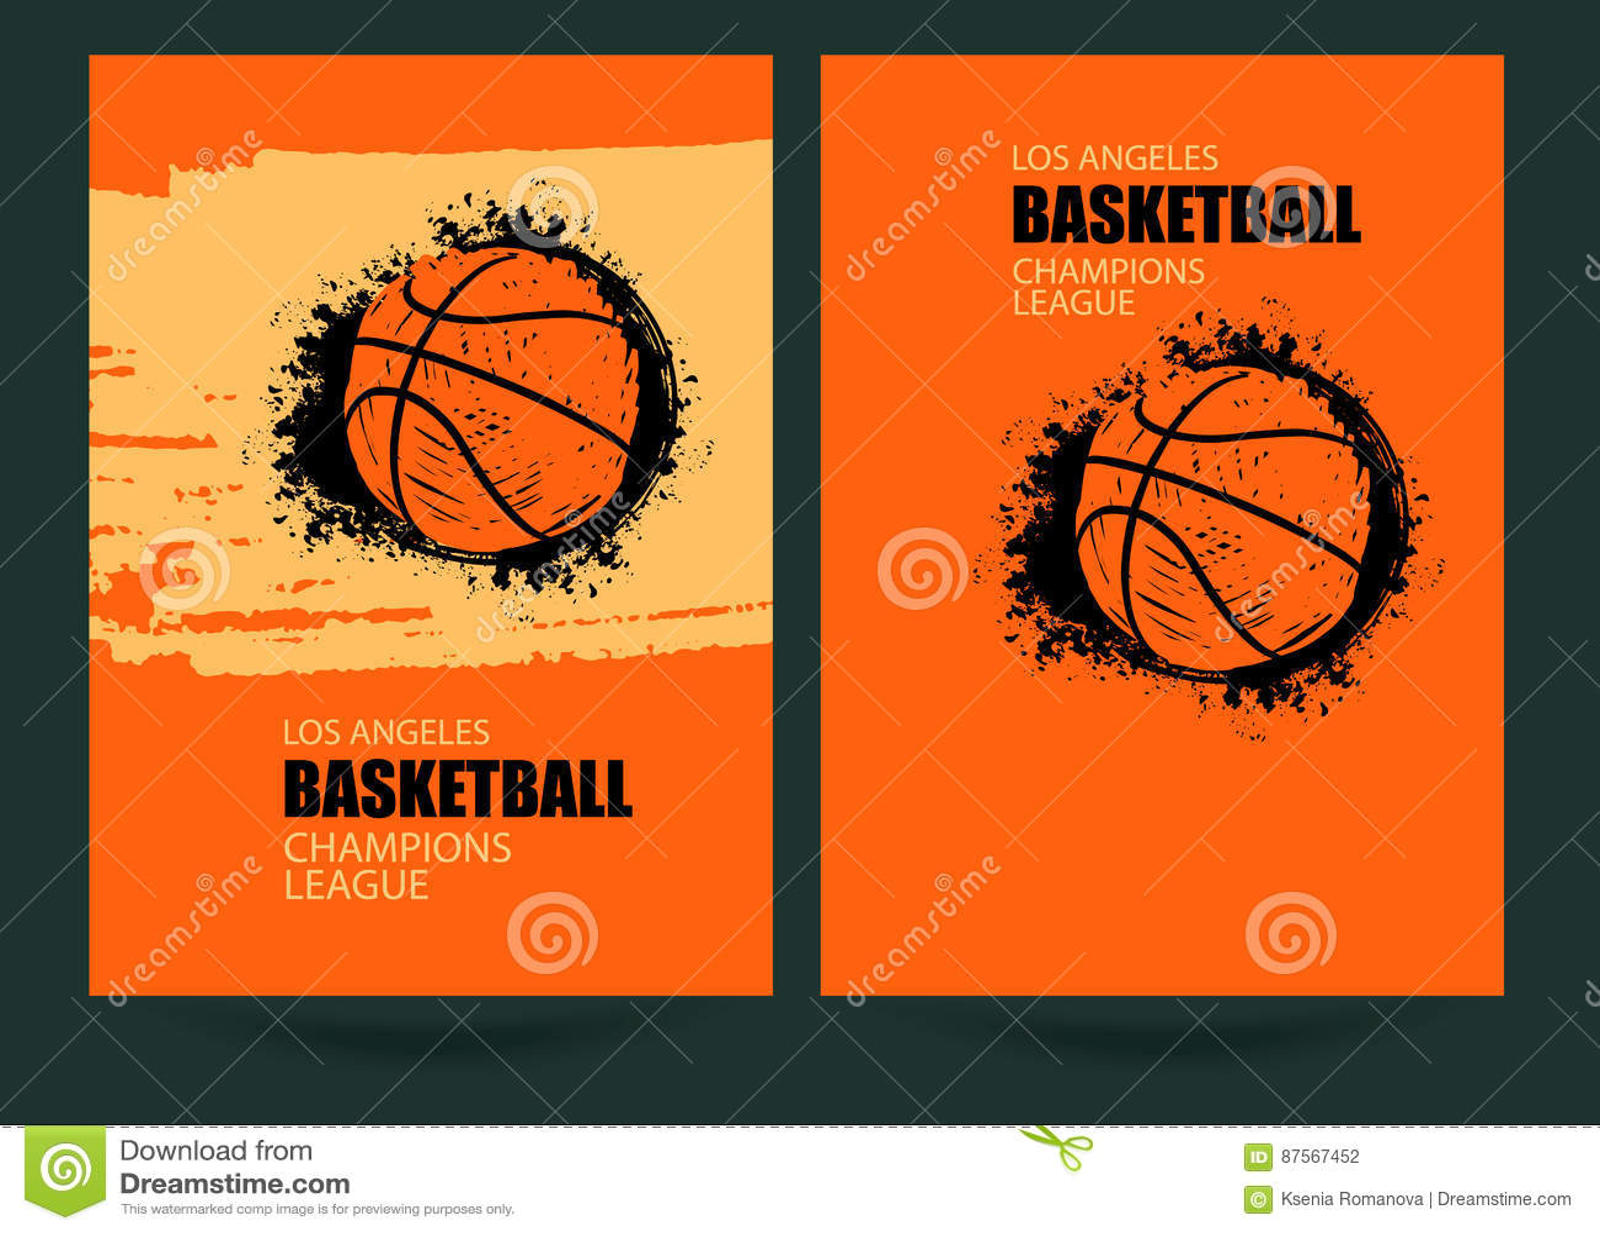 basketball grunge posters design stock illustration illustration